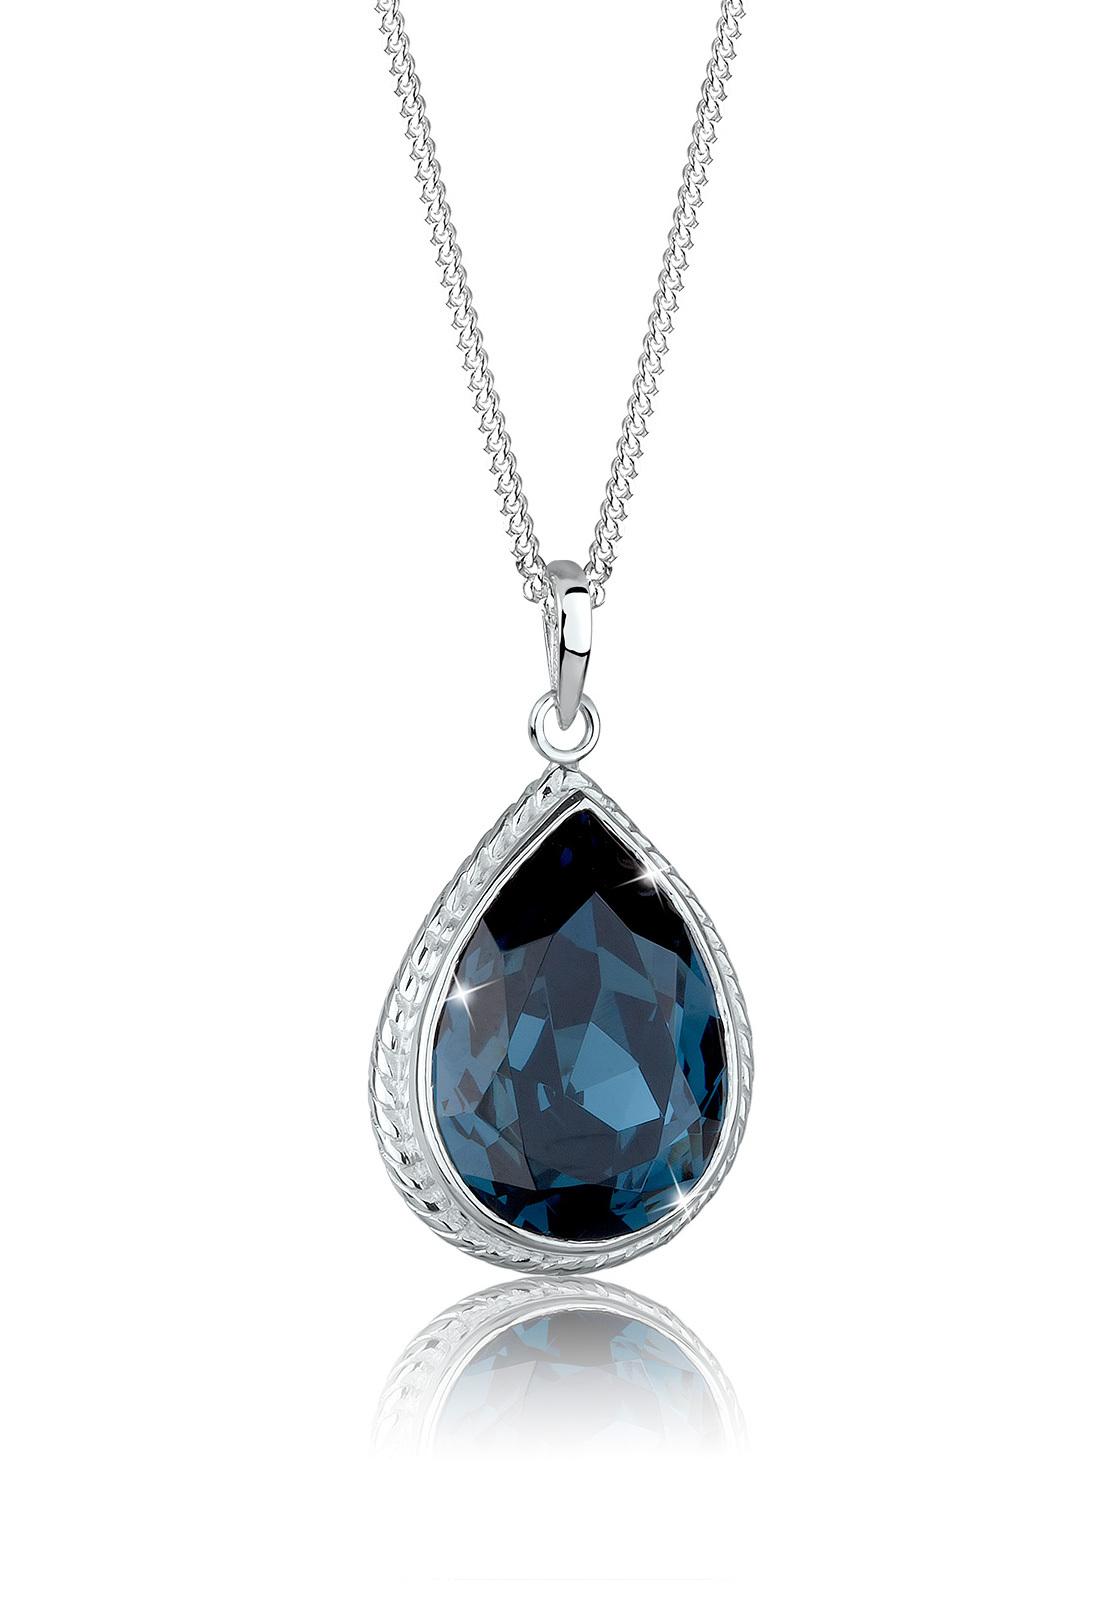 Halskette Tropfen   Kristall ( Blau )   925er Sterling Silber